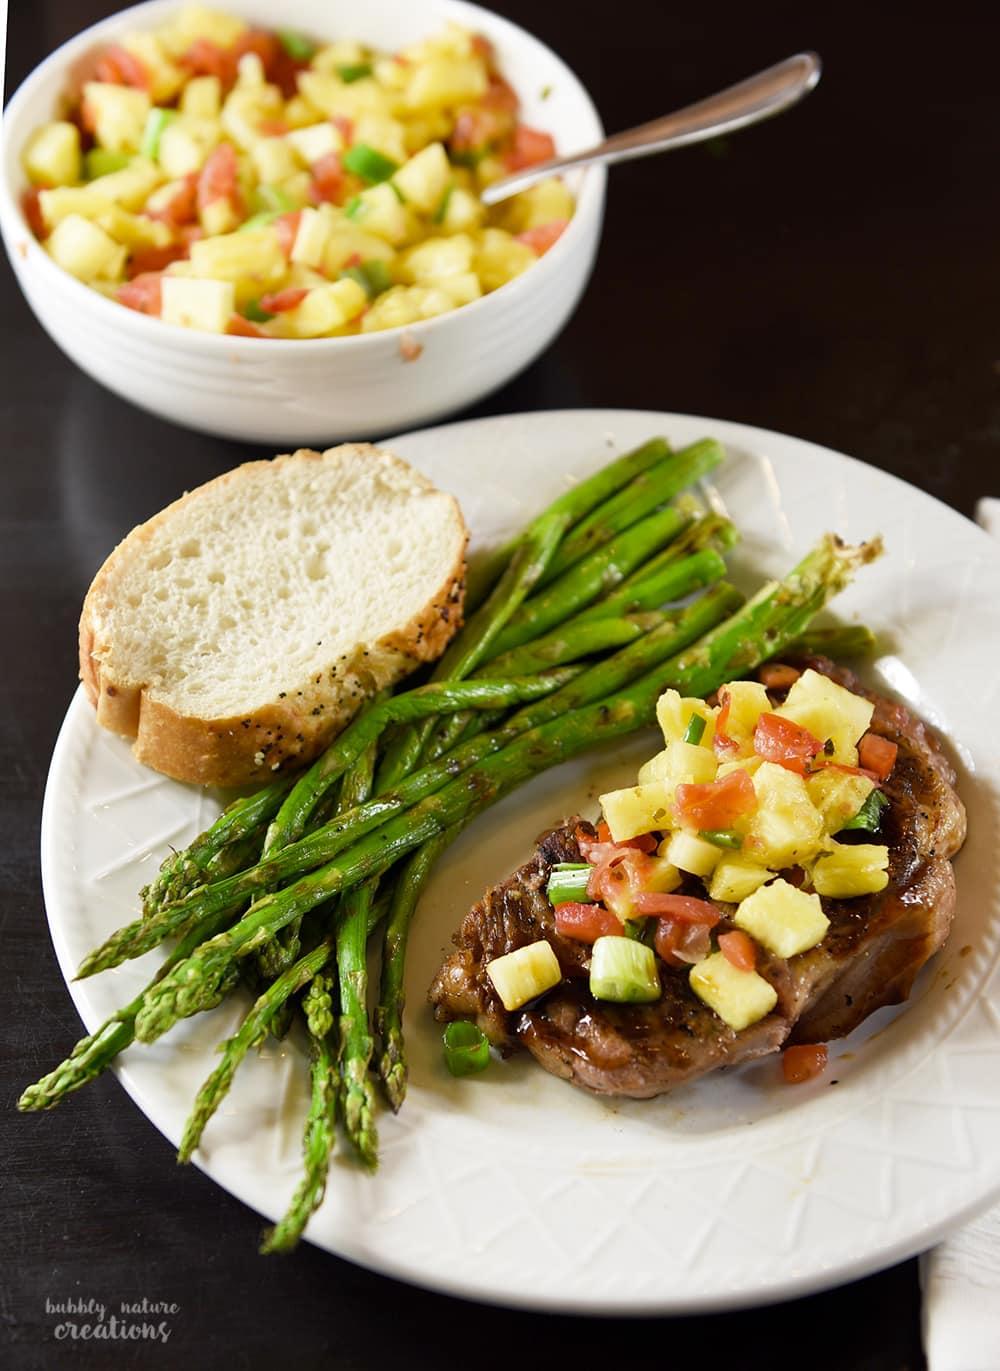 knifeskills teriyaki steak with pineapple salsa a great weeknight meal idea